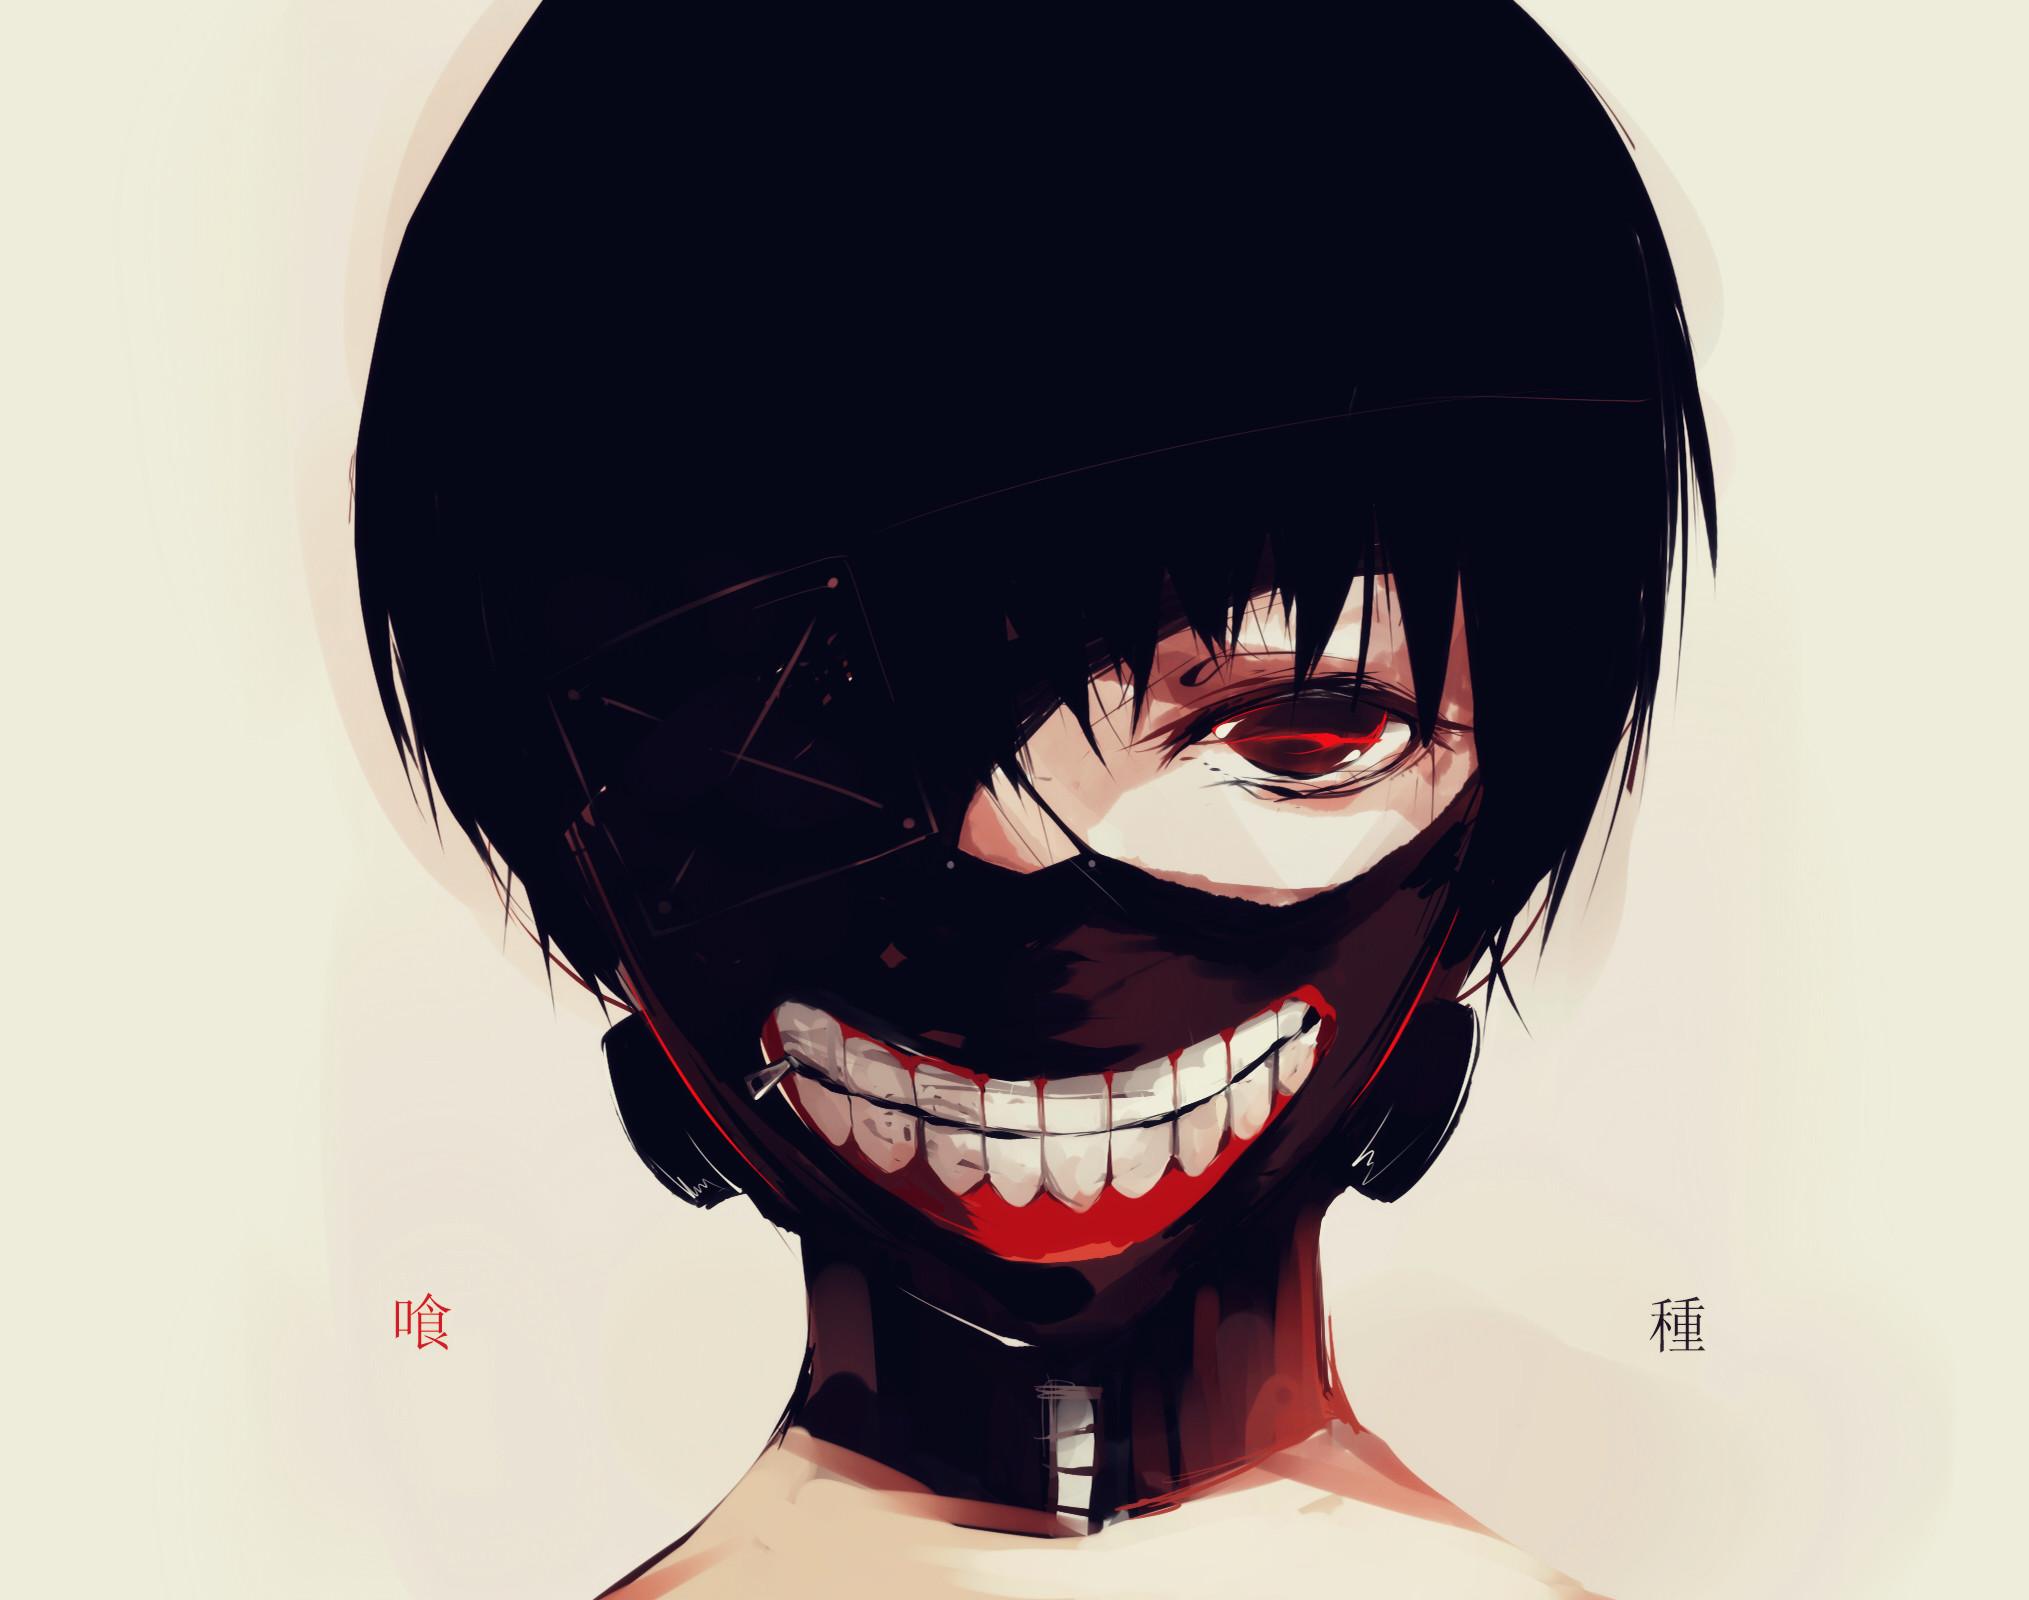 Tokyo Ghoul Mask tokyoghoul Image manga, Manga, Anime